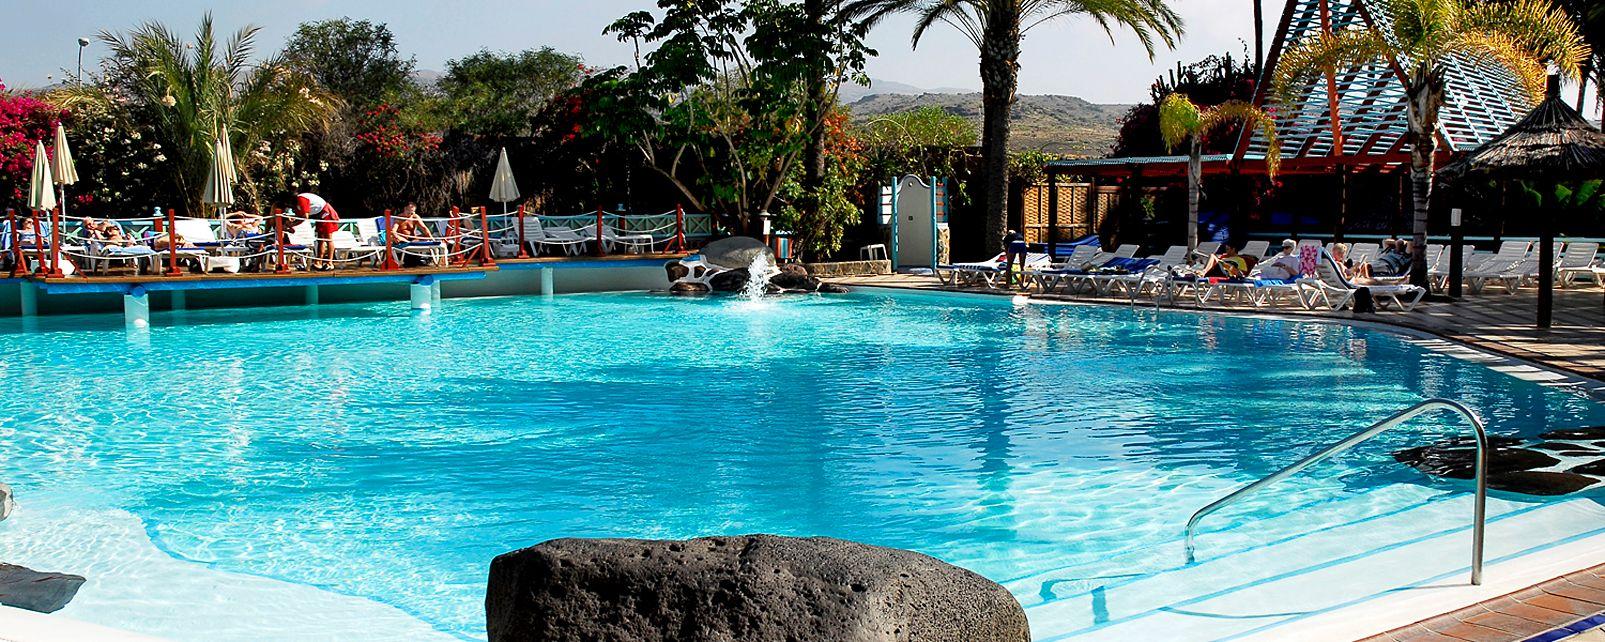 Hôtel Abora Continental by Lopesan Hotels